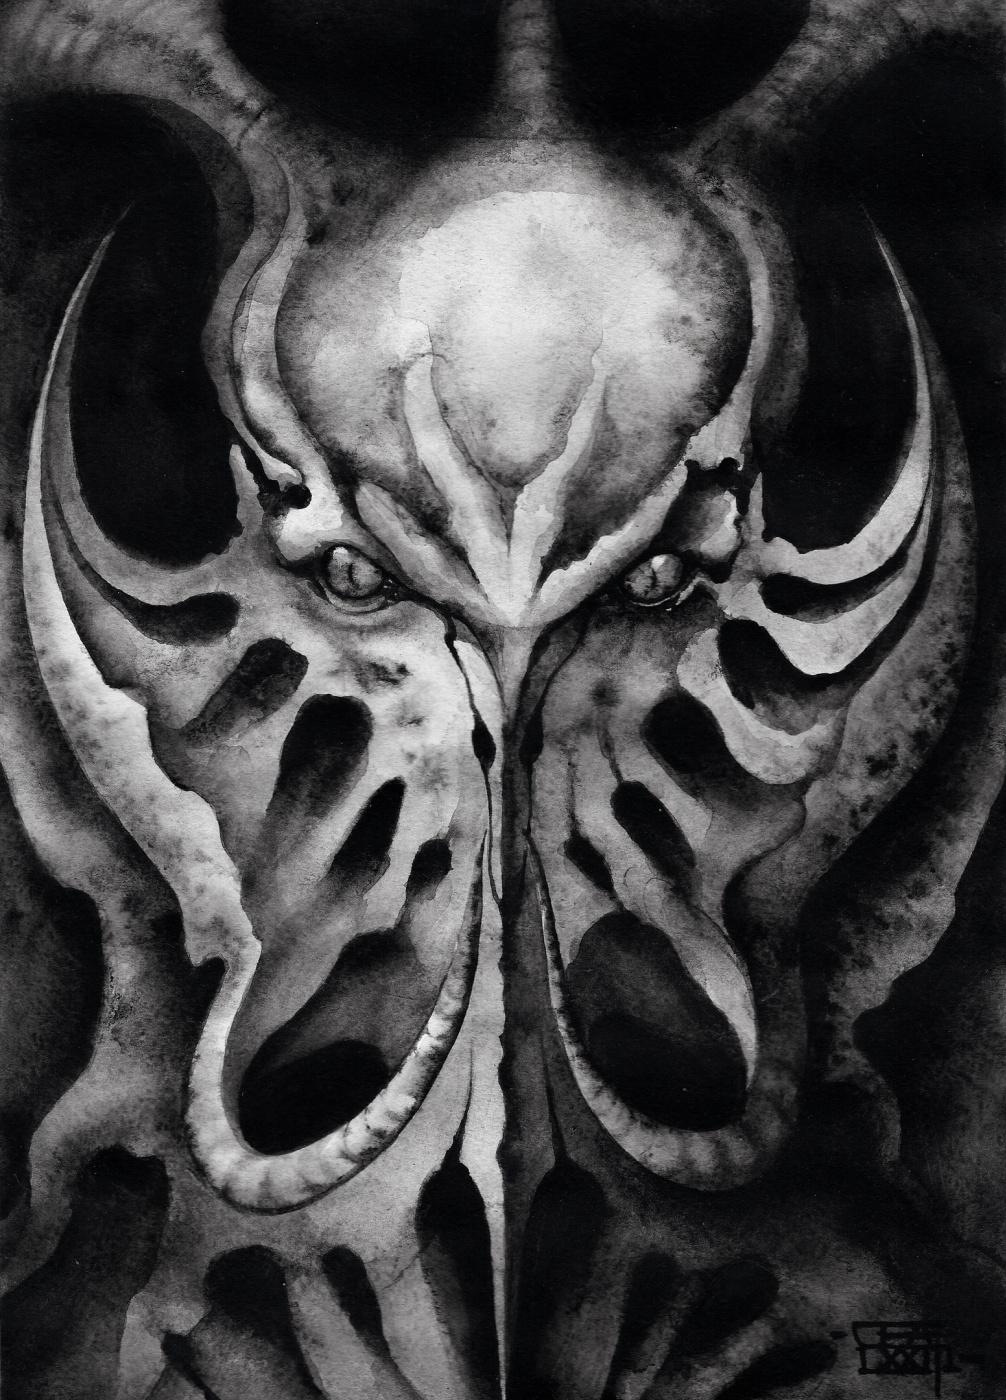 CEA 73. Alien creature